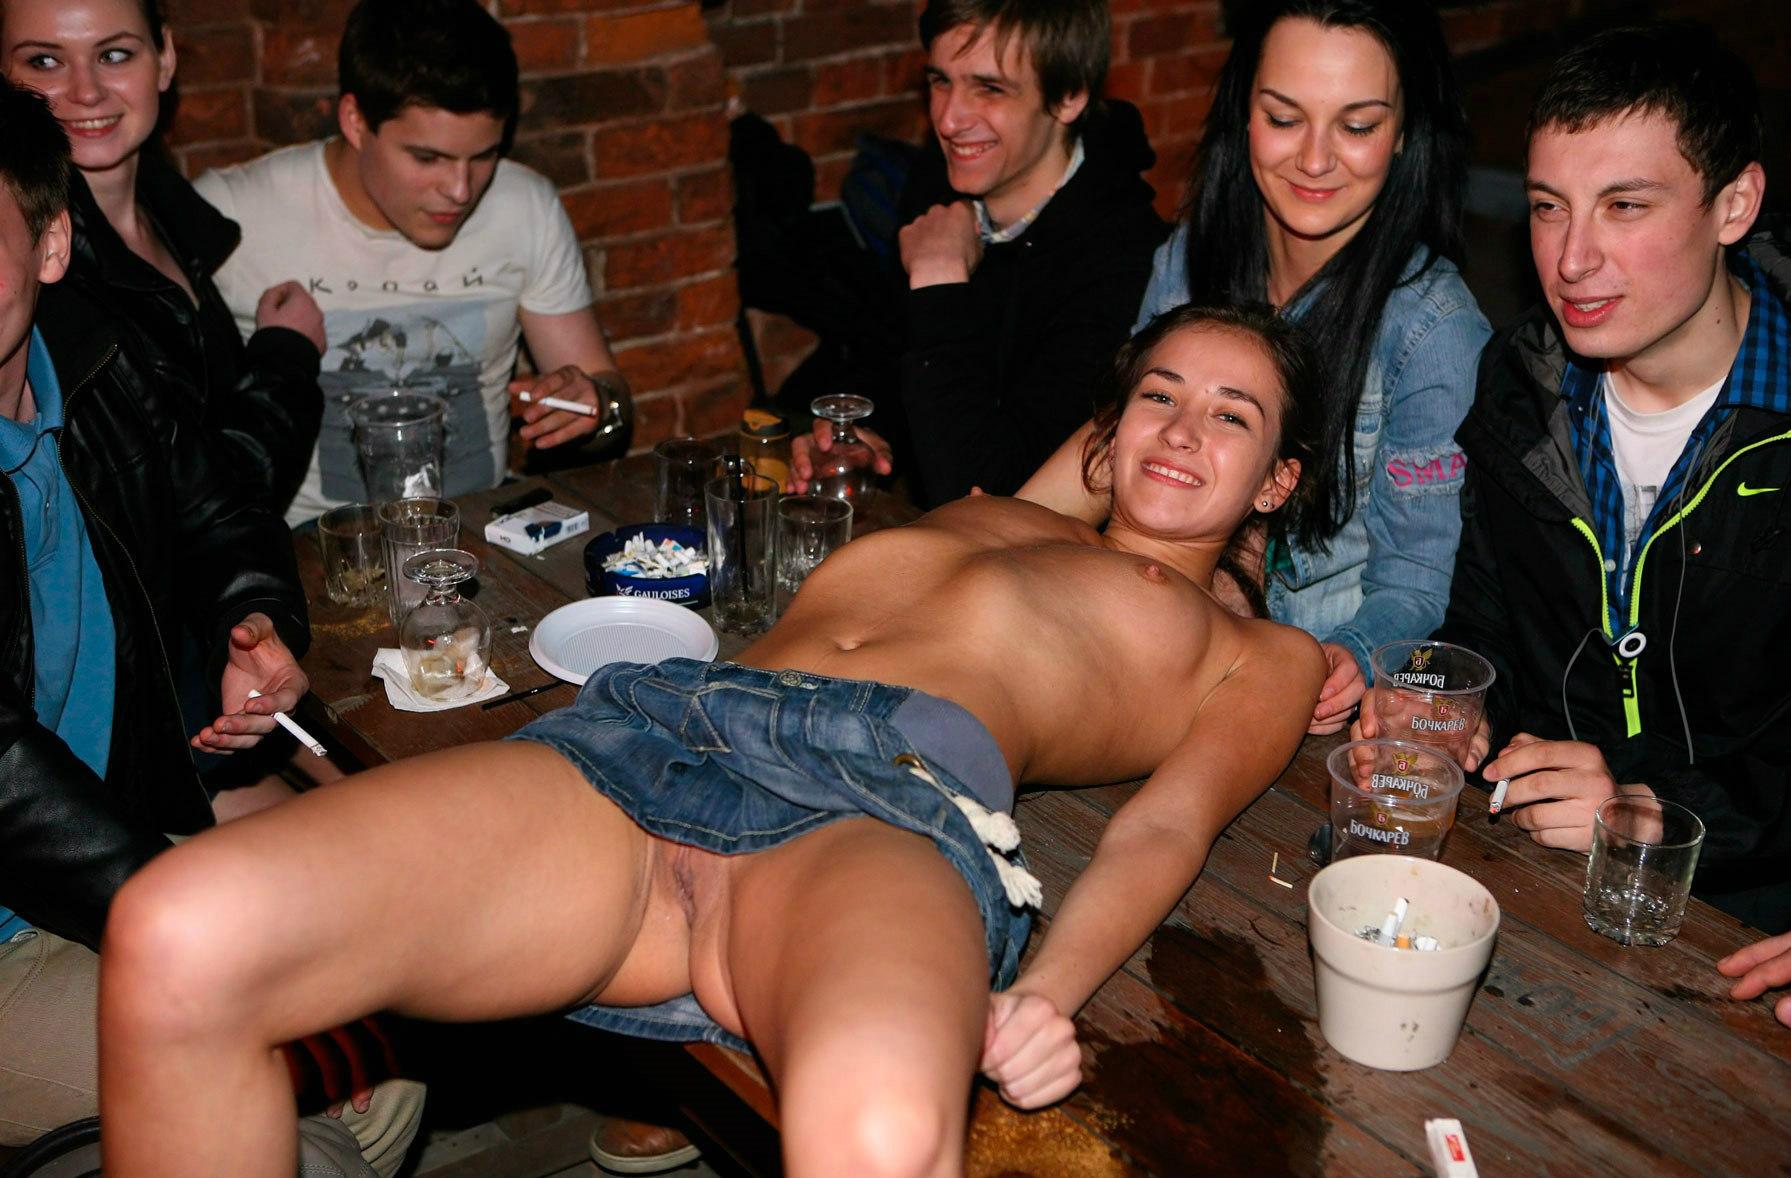 Crazy russians публичное порно